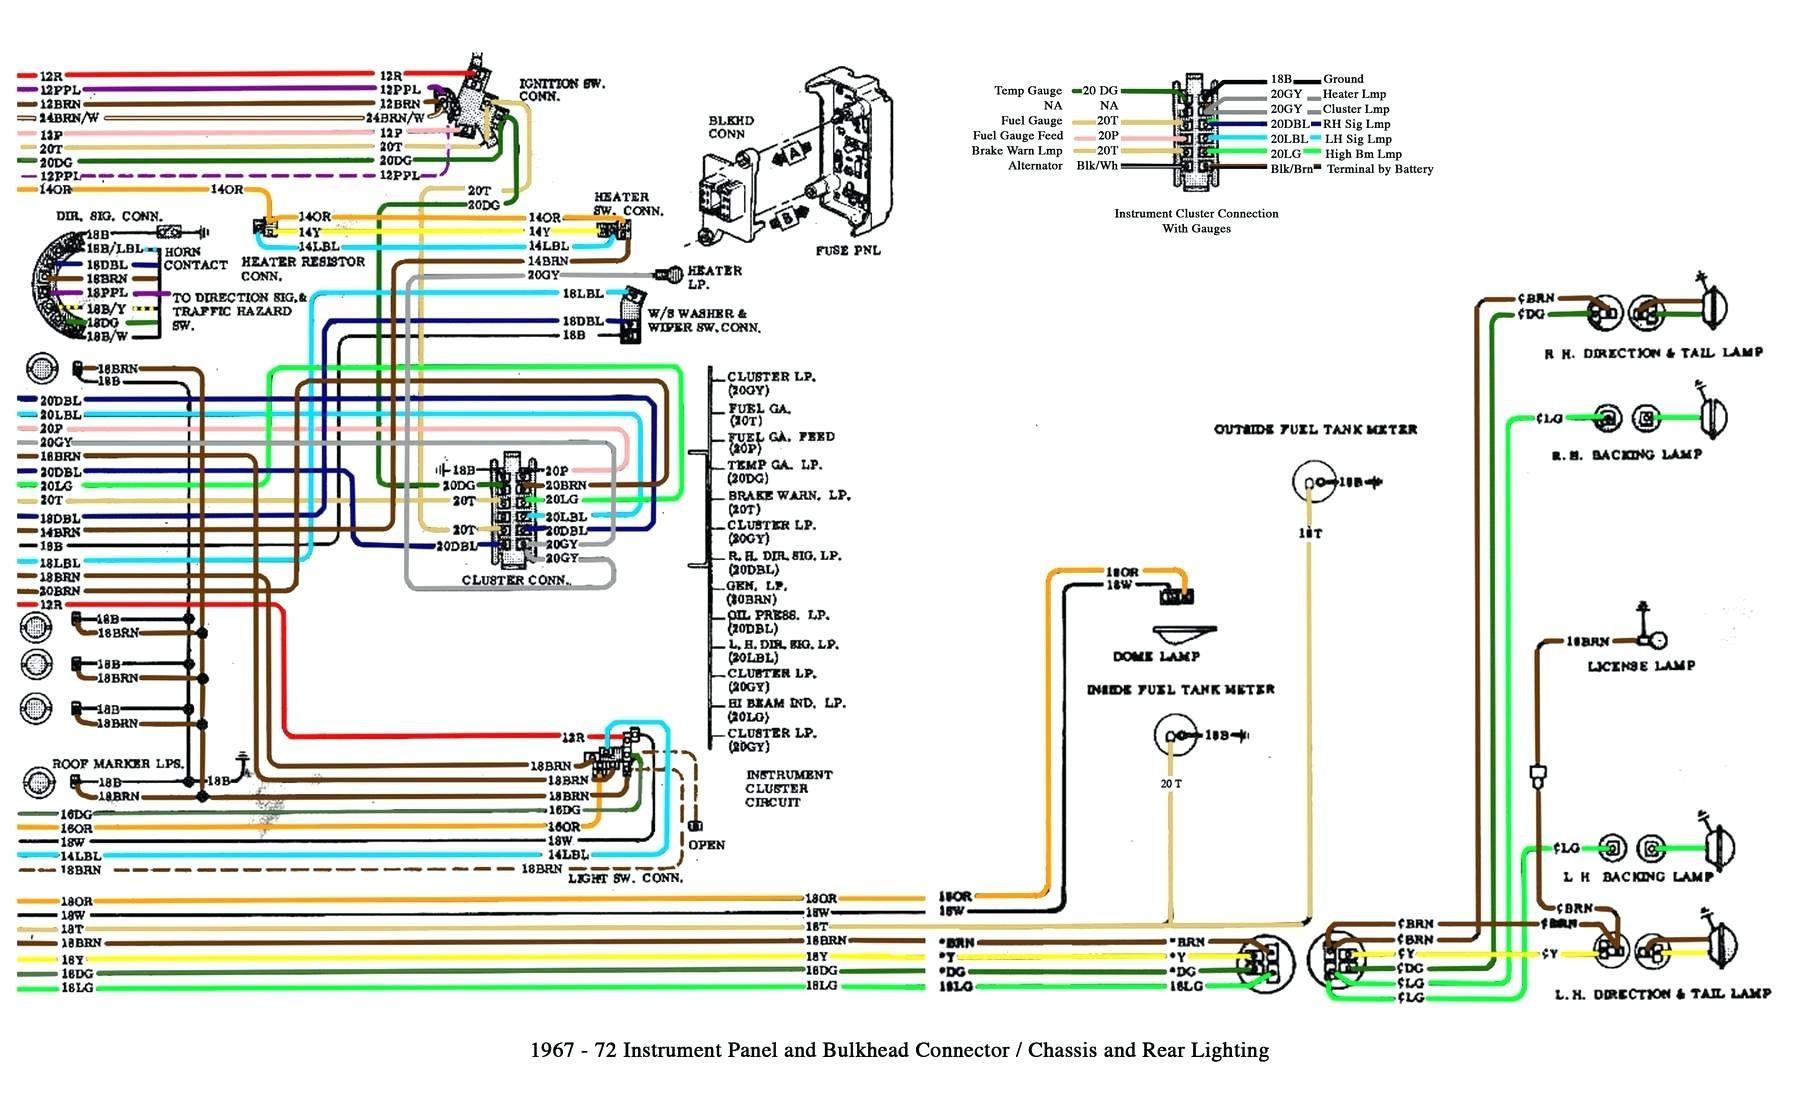 1994 toyota Pickup Wiring Diagram Beautiful 1994 toyota Pickup Wiring Diagram Everything You Of 1994 toyota Pickup Wiring Diagram